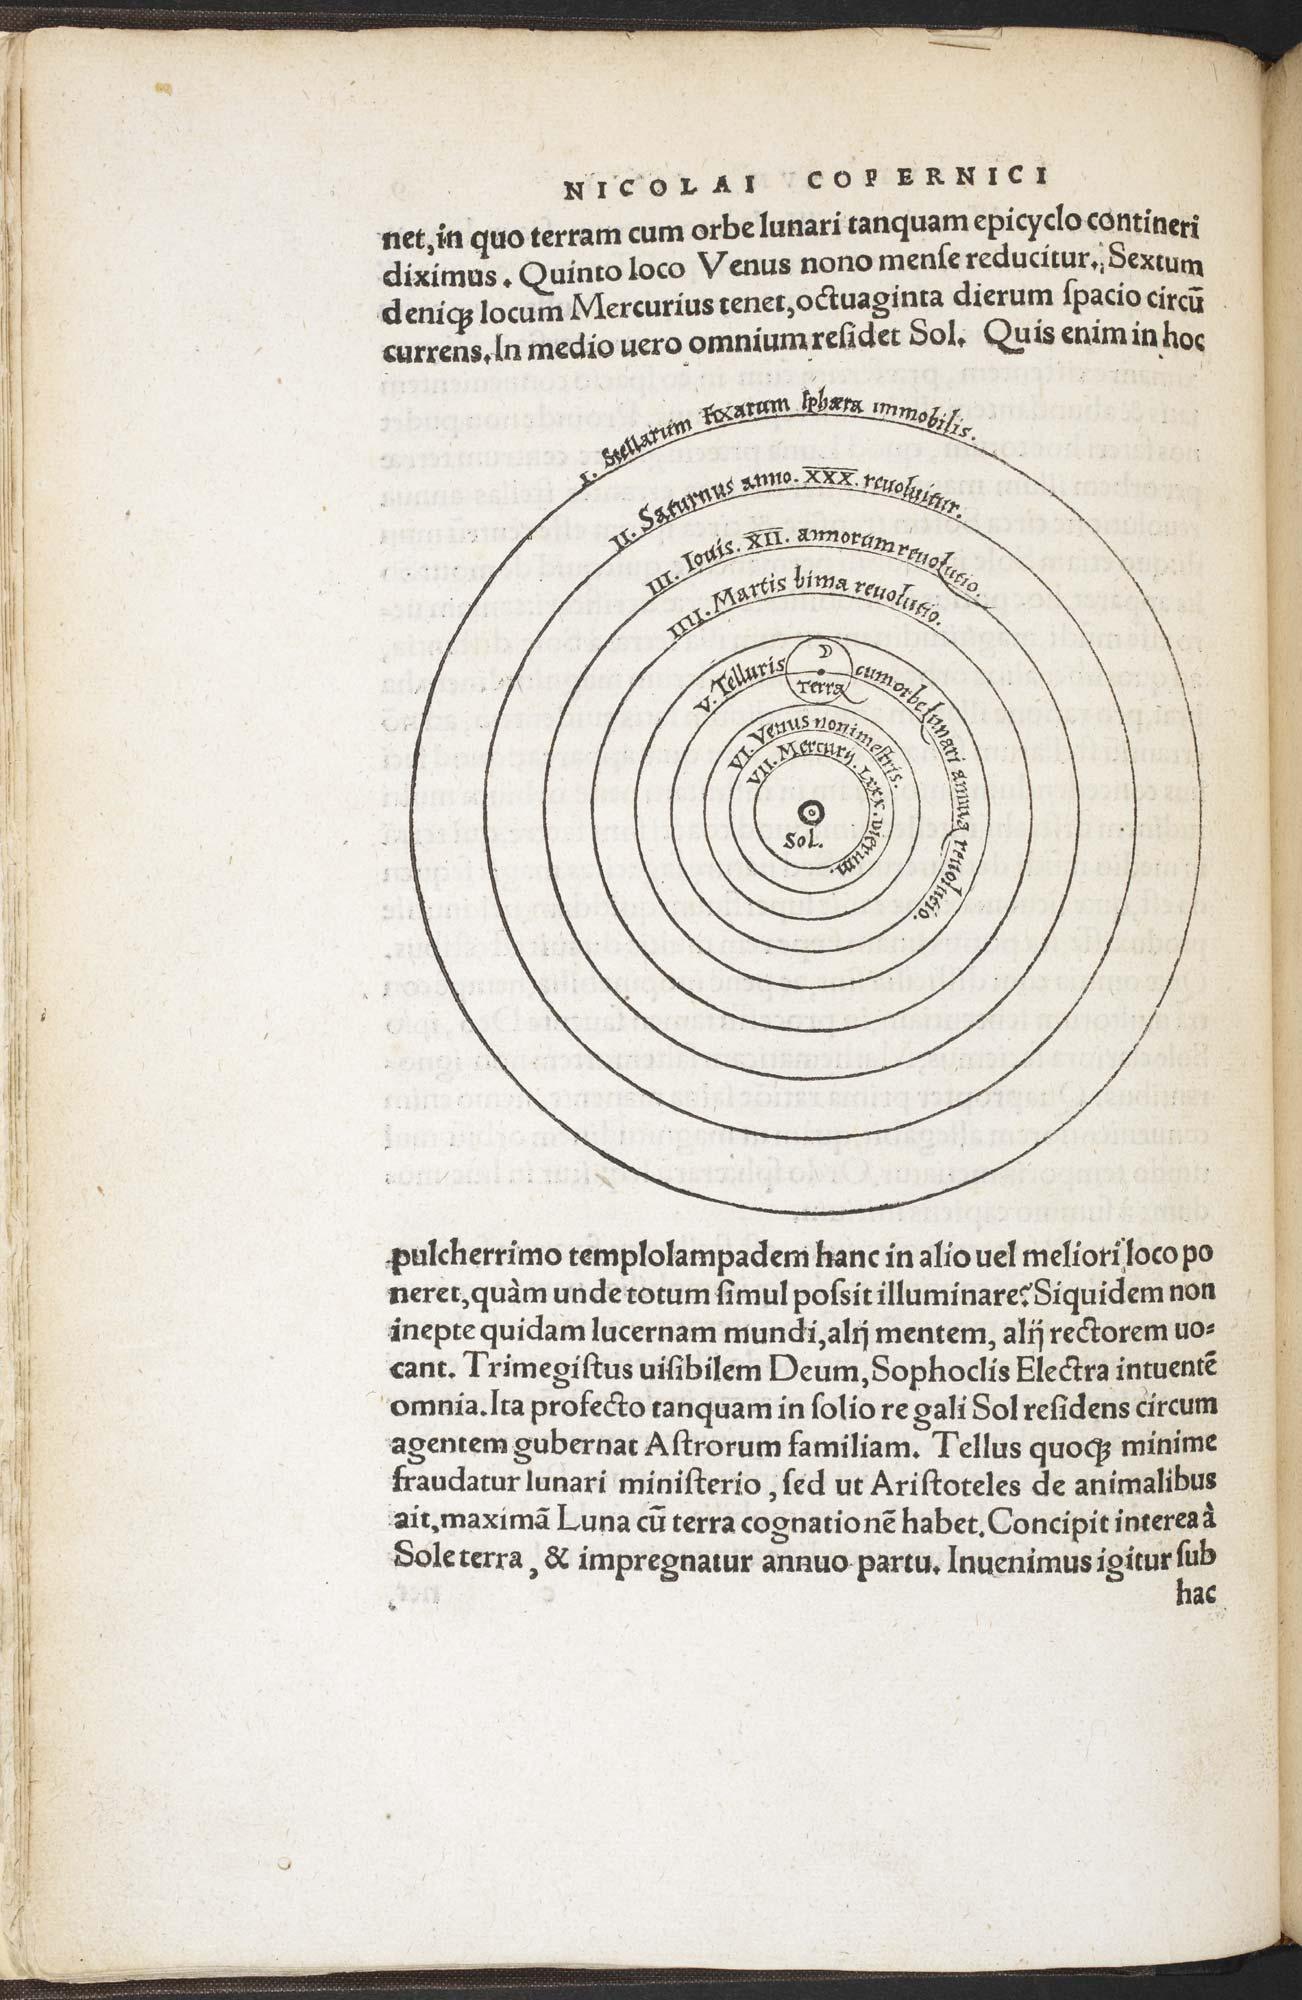 Copernicus' celestial spheres